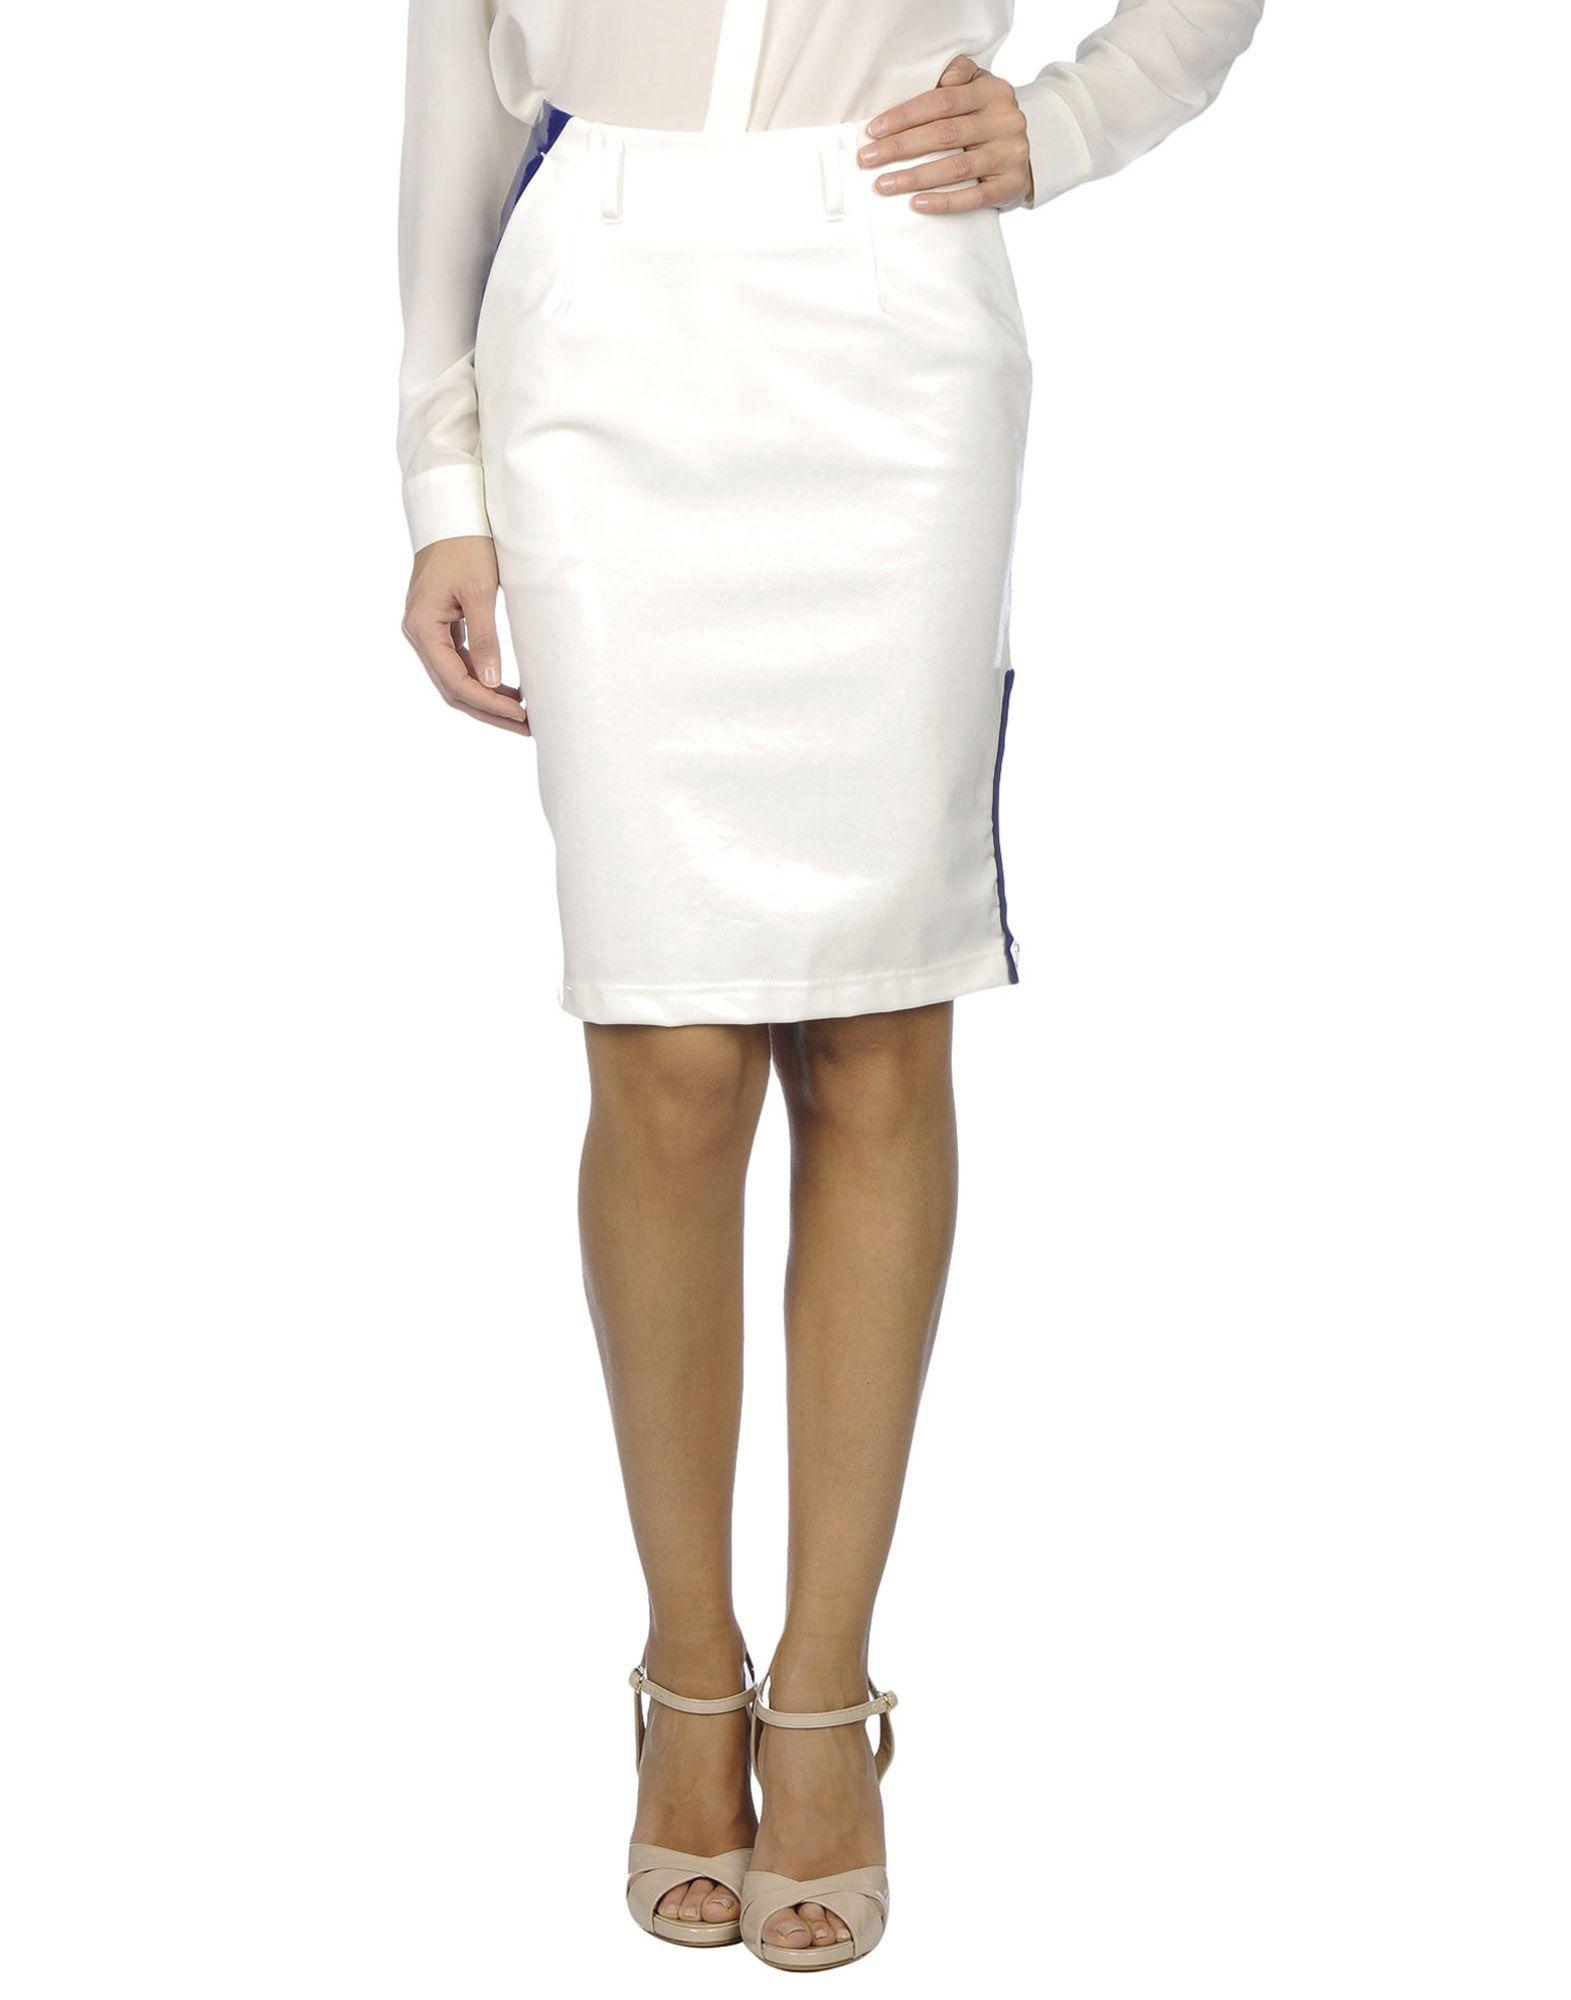 KOLOR Damen Knielanger Rock Farbe Weiß Größe 3